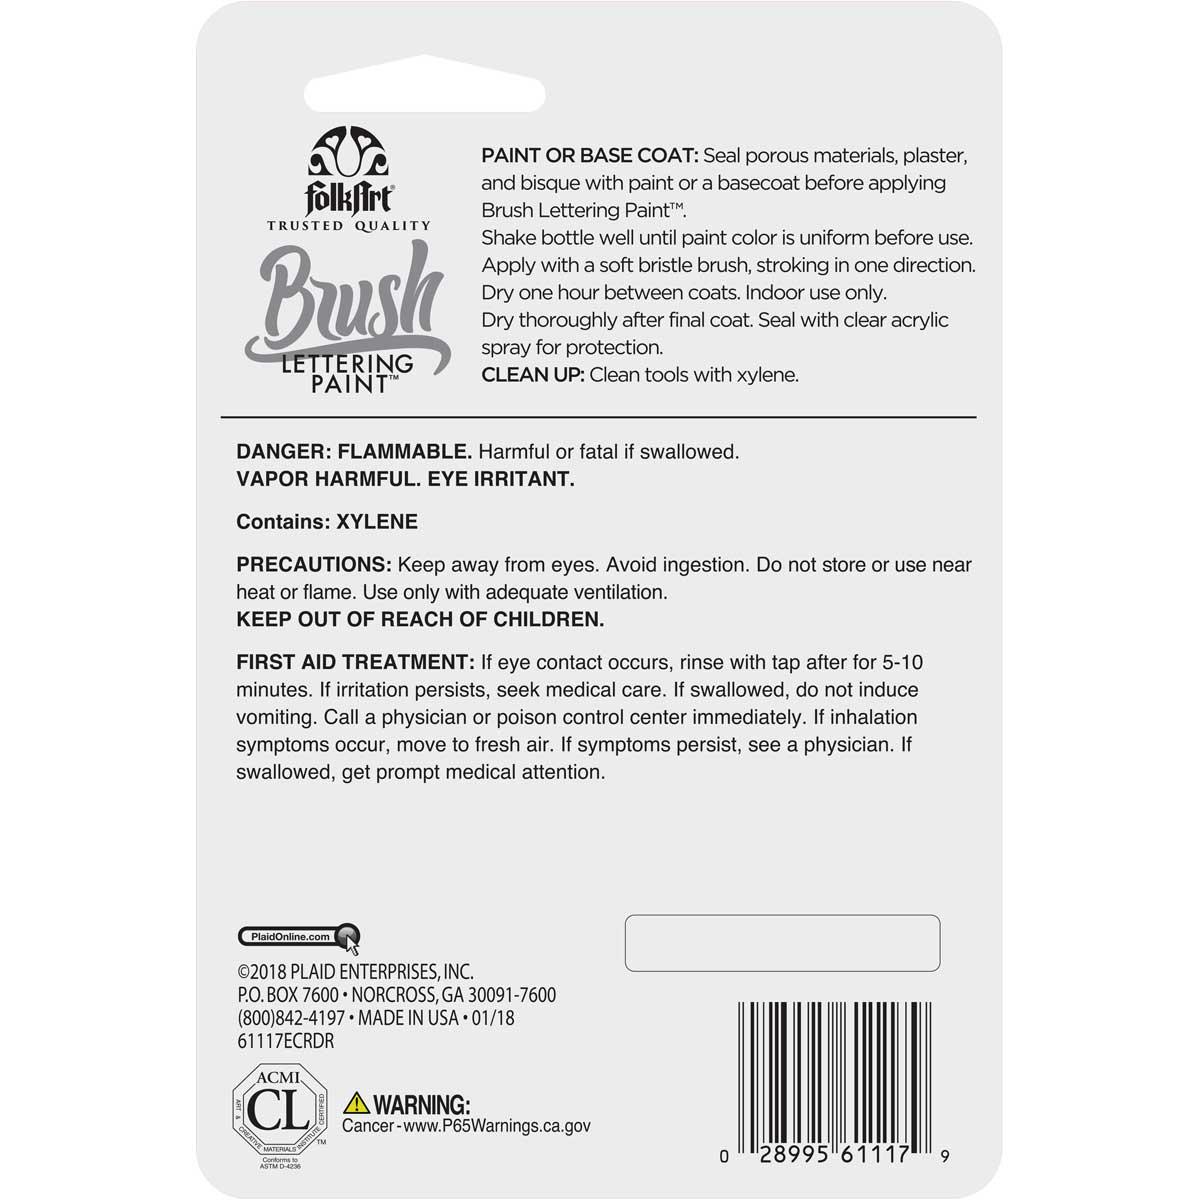 FolkArt ® Brush Lettering Paint - Espresso, 1 oz. - 61117E